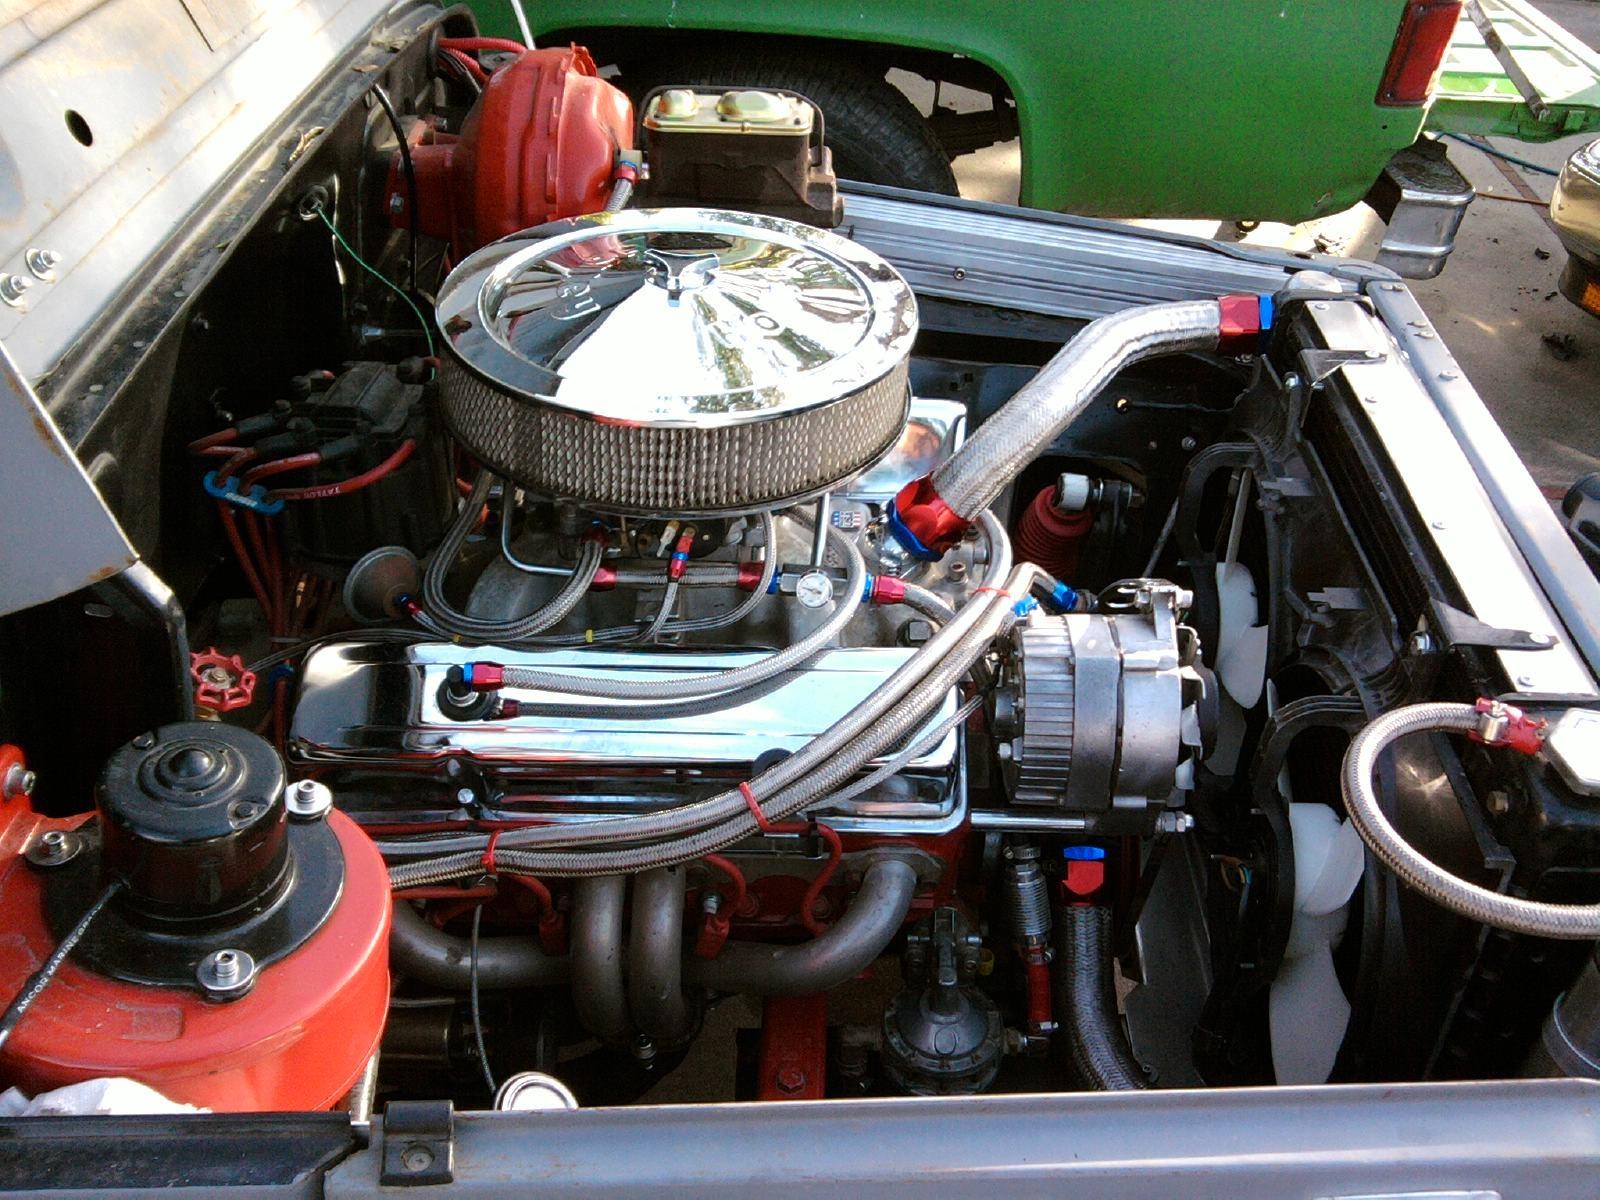 Toyota Fj40 Questions Motor Swap Cargurus